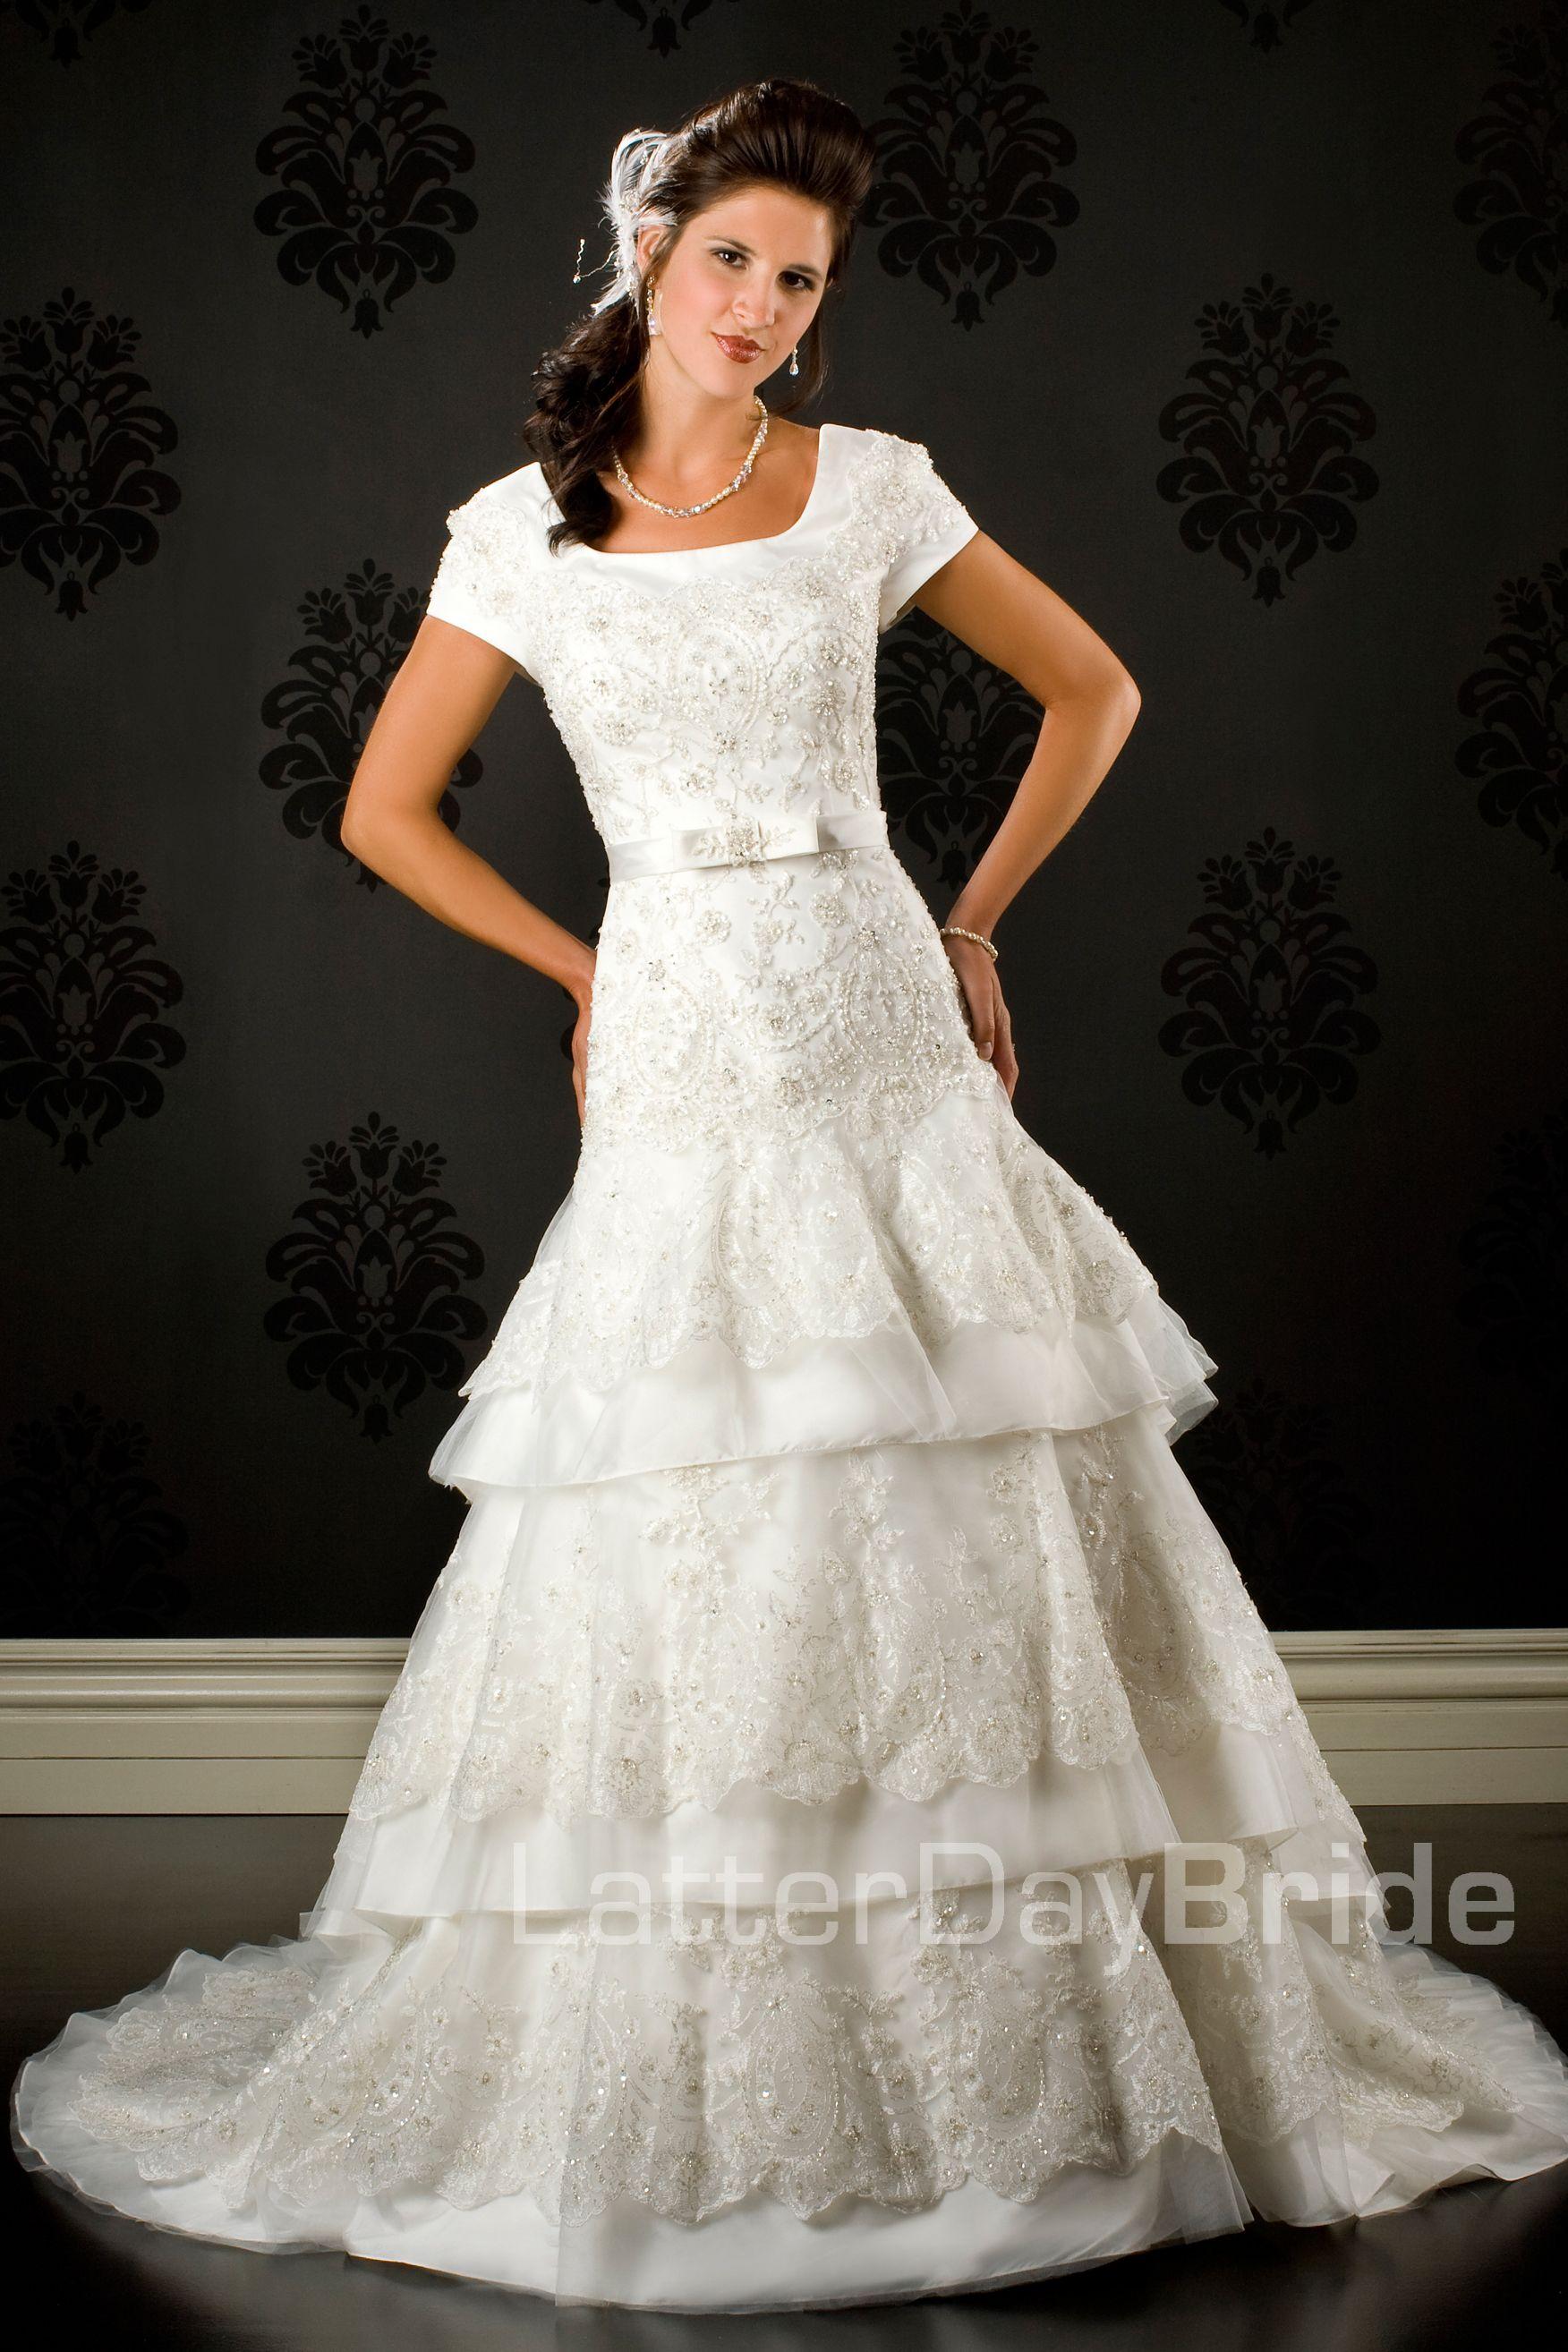 Lace (Wedding) Cajetan 1340.00 Modest wedding dresses